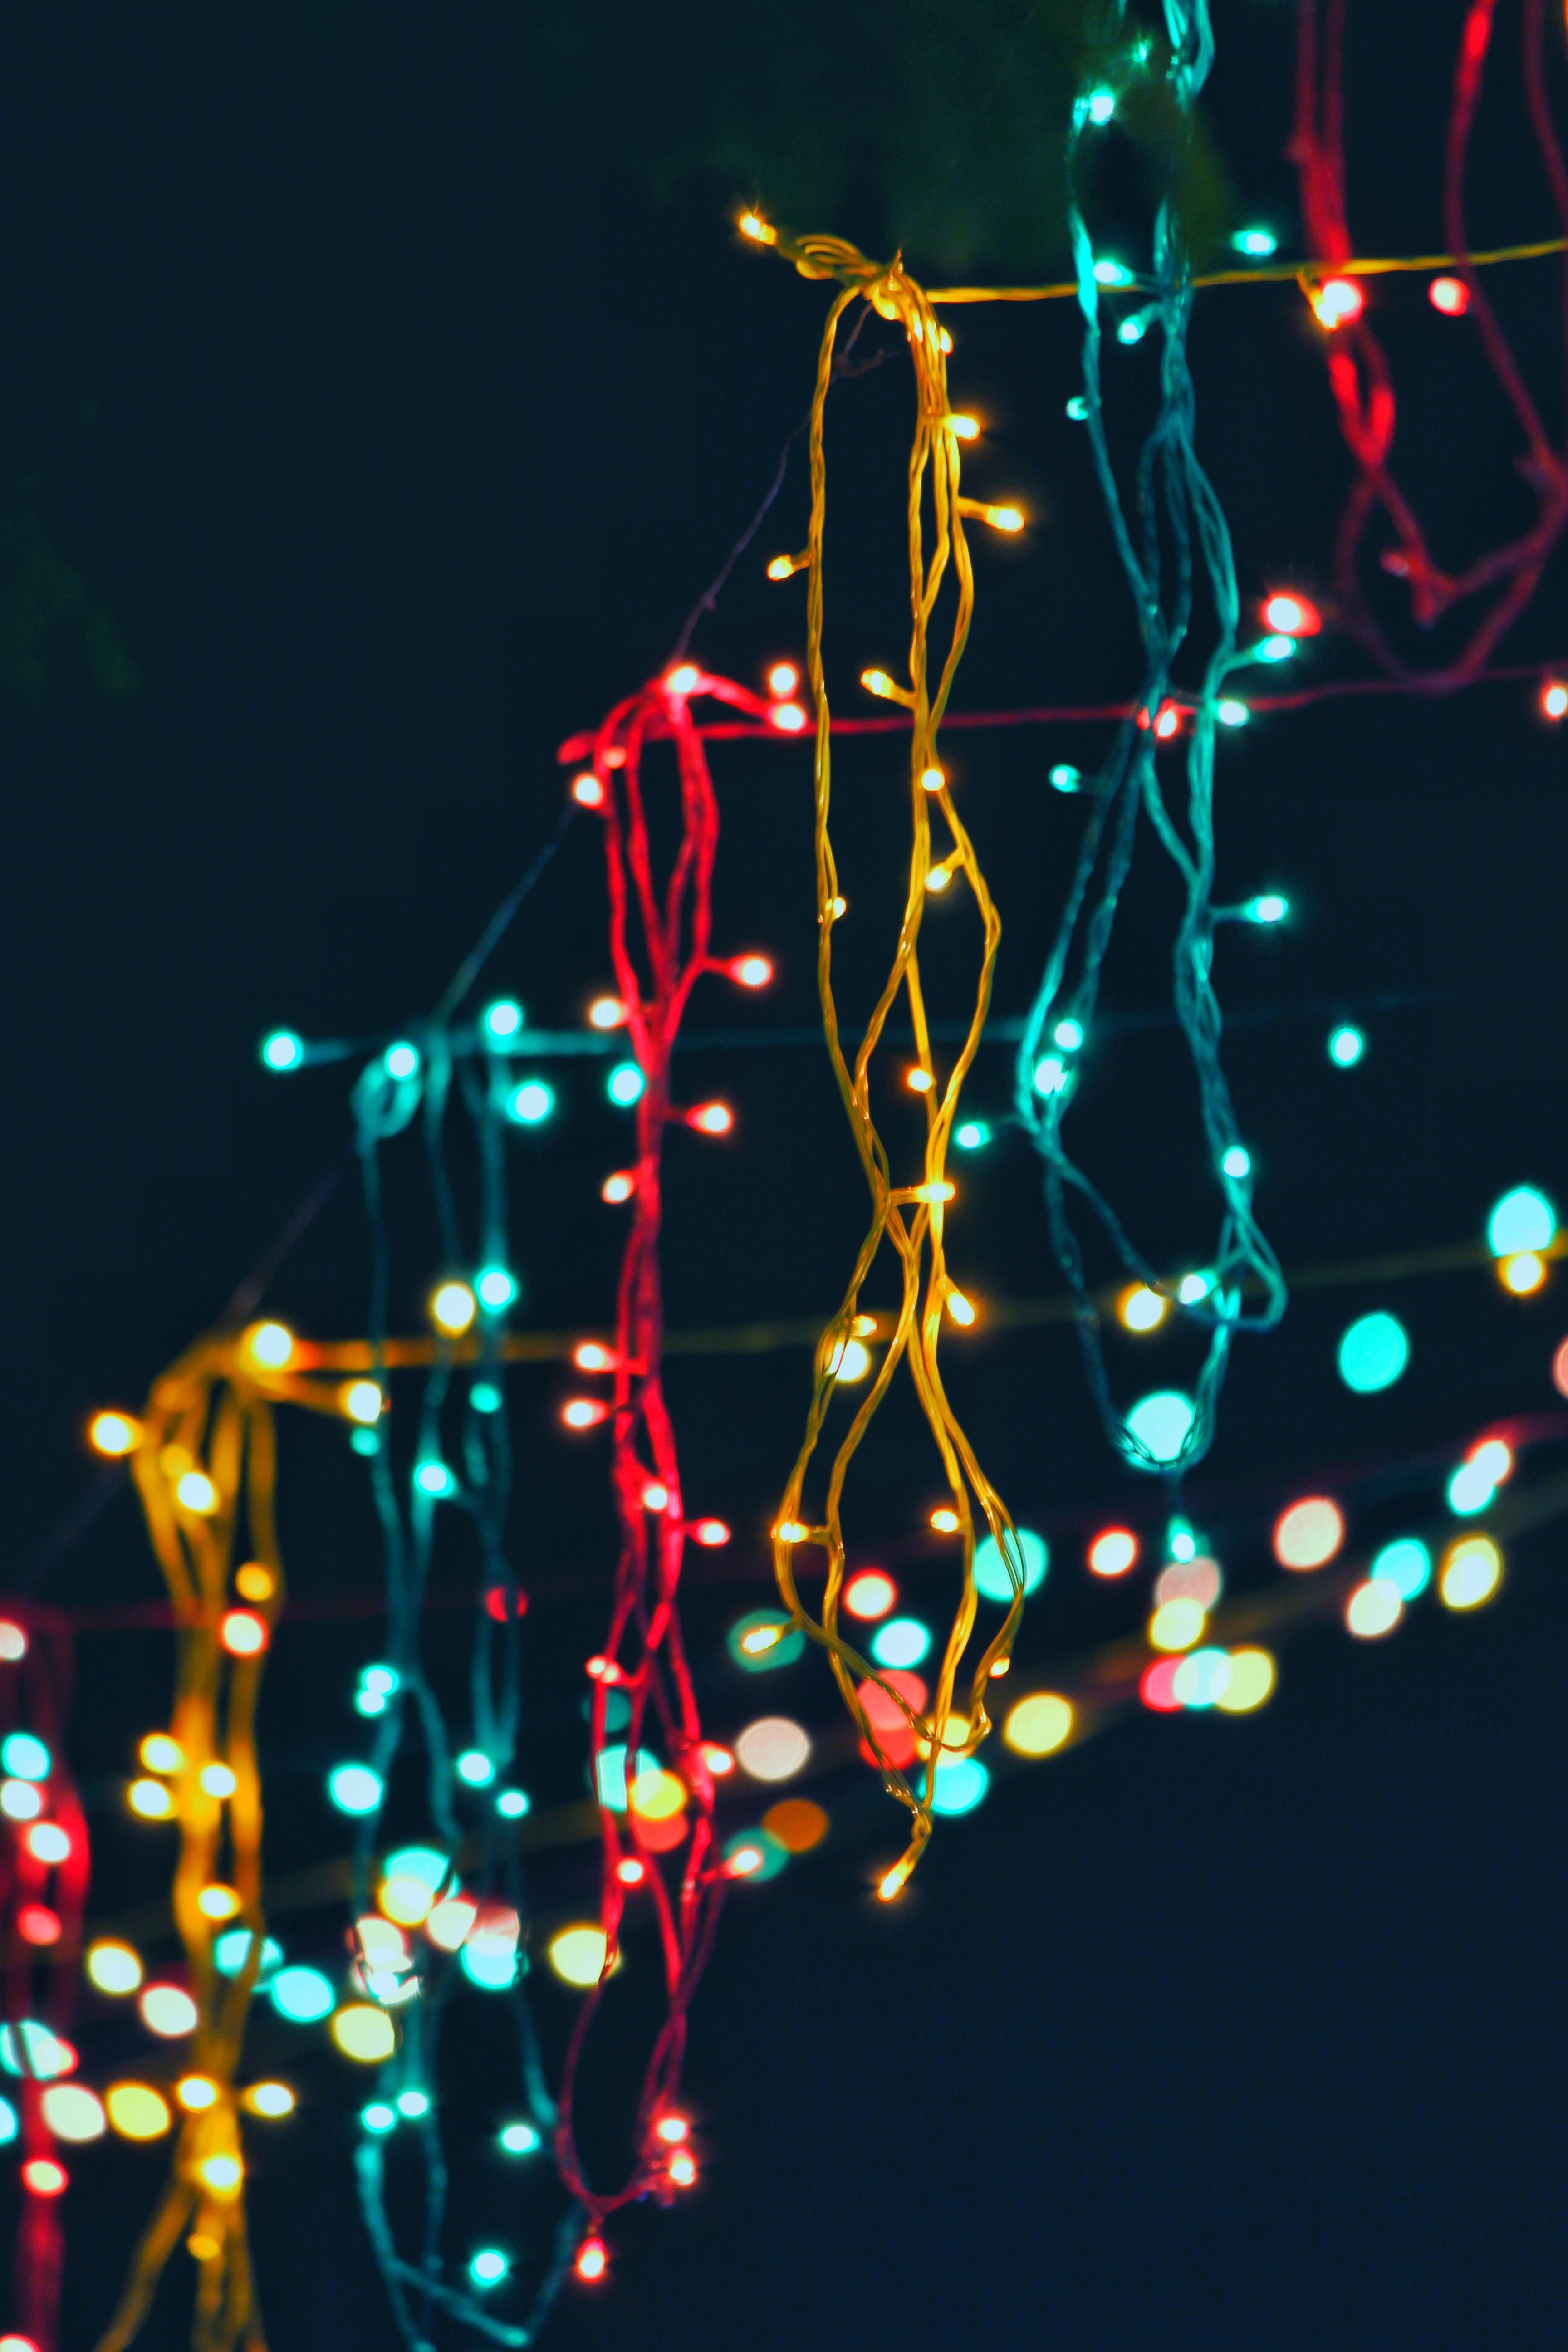 Assorted Lighted String Lights